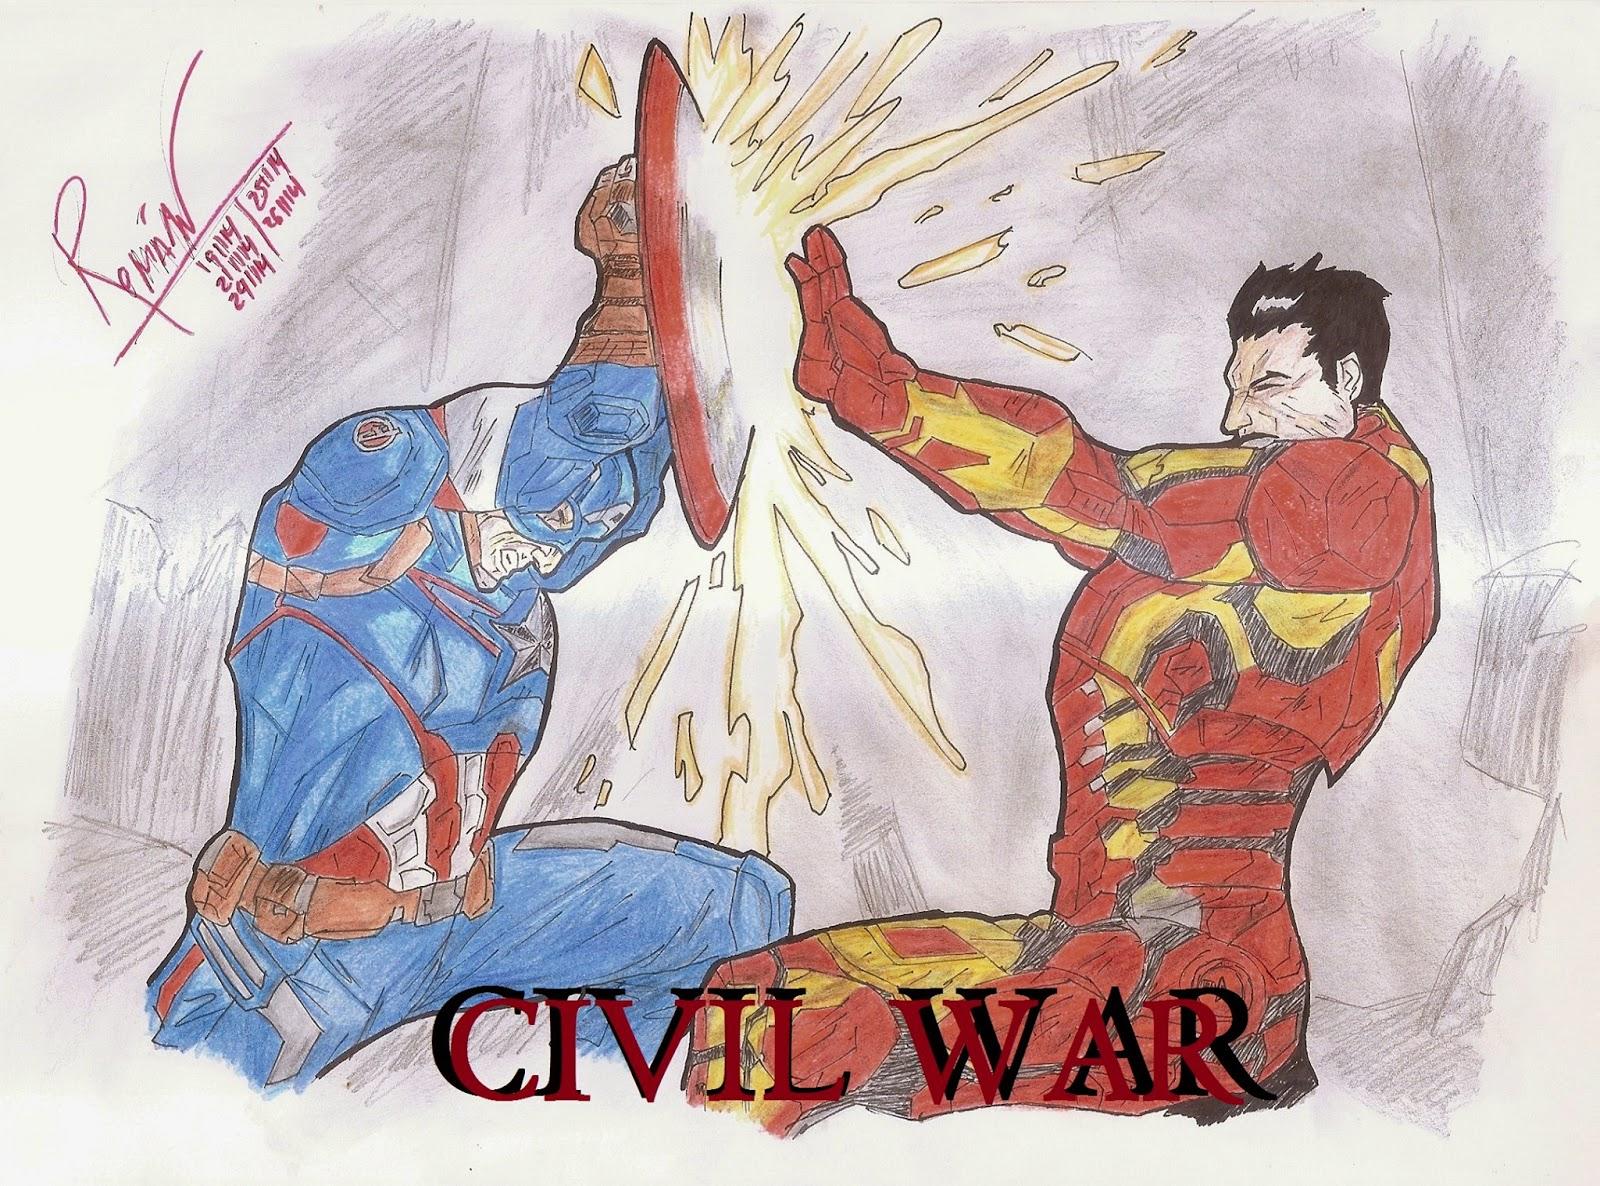 Civil War | Mr. Pencilmaniac